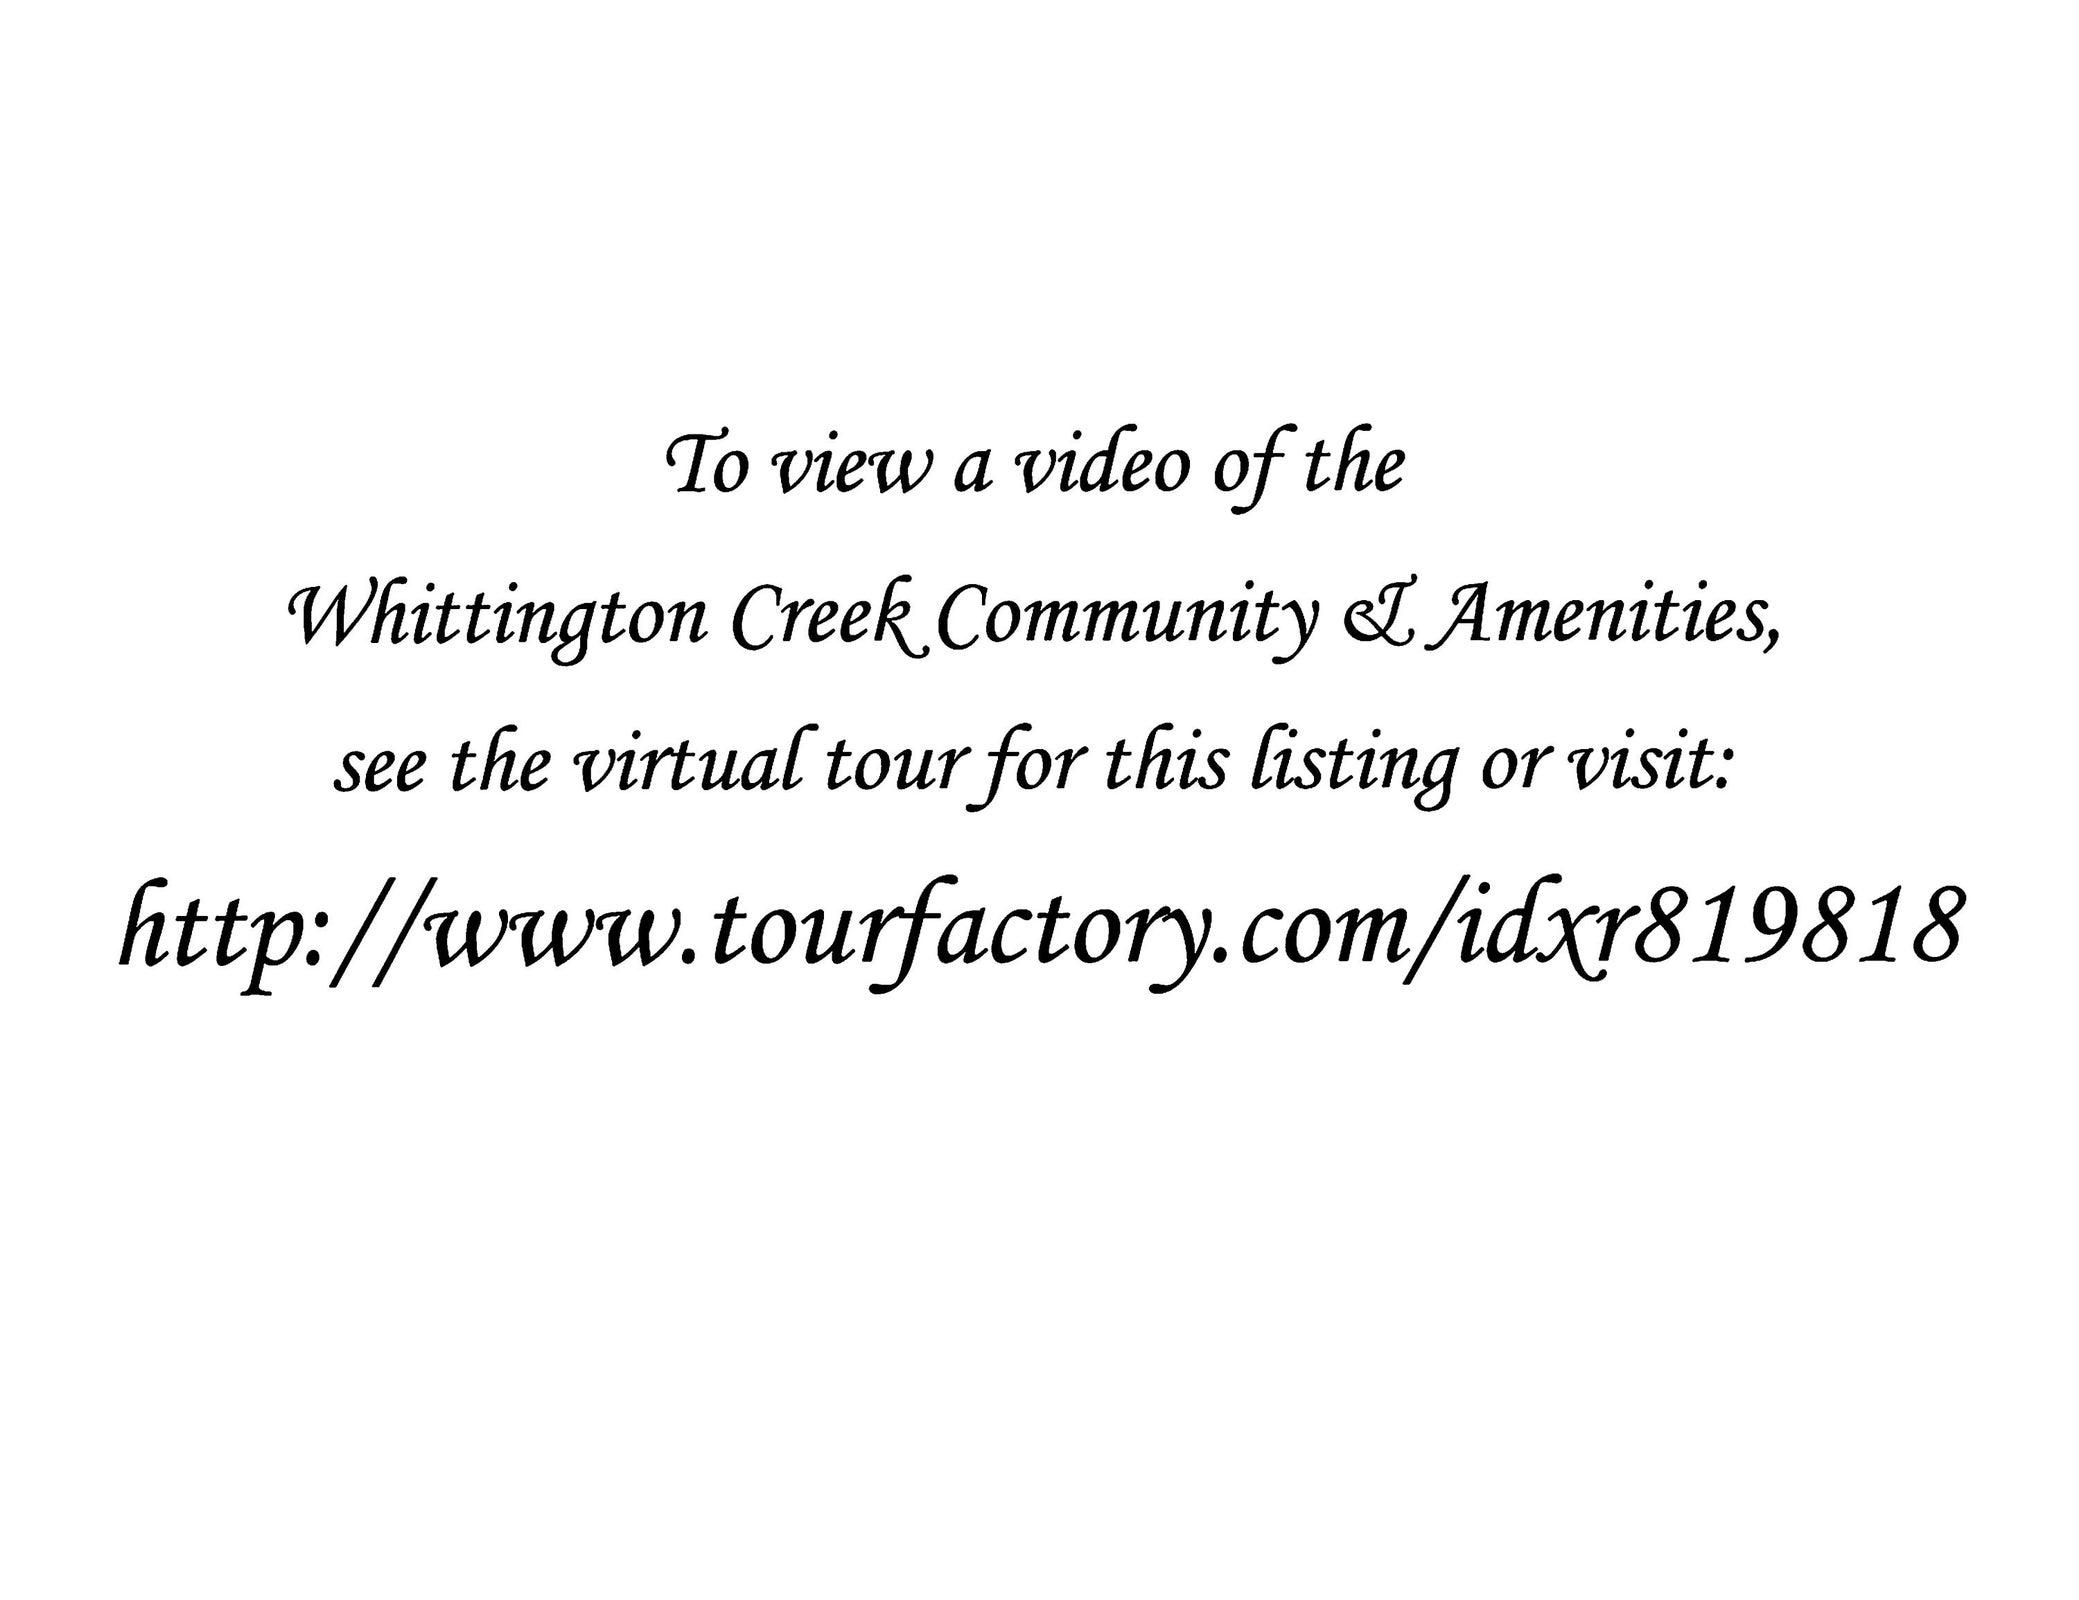 Whittington Creek Virtual Tour Link